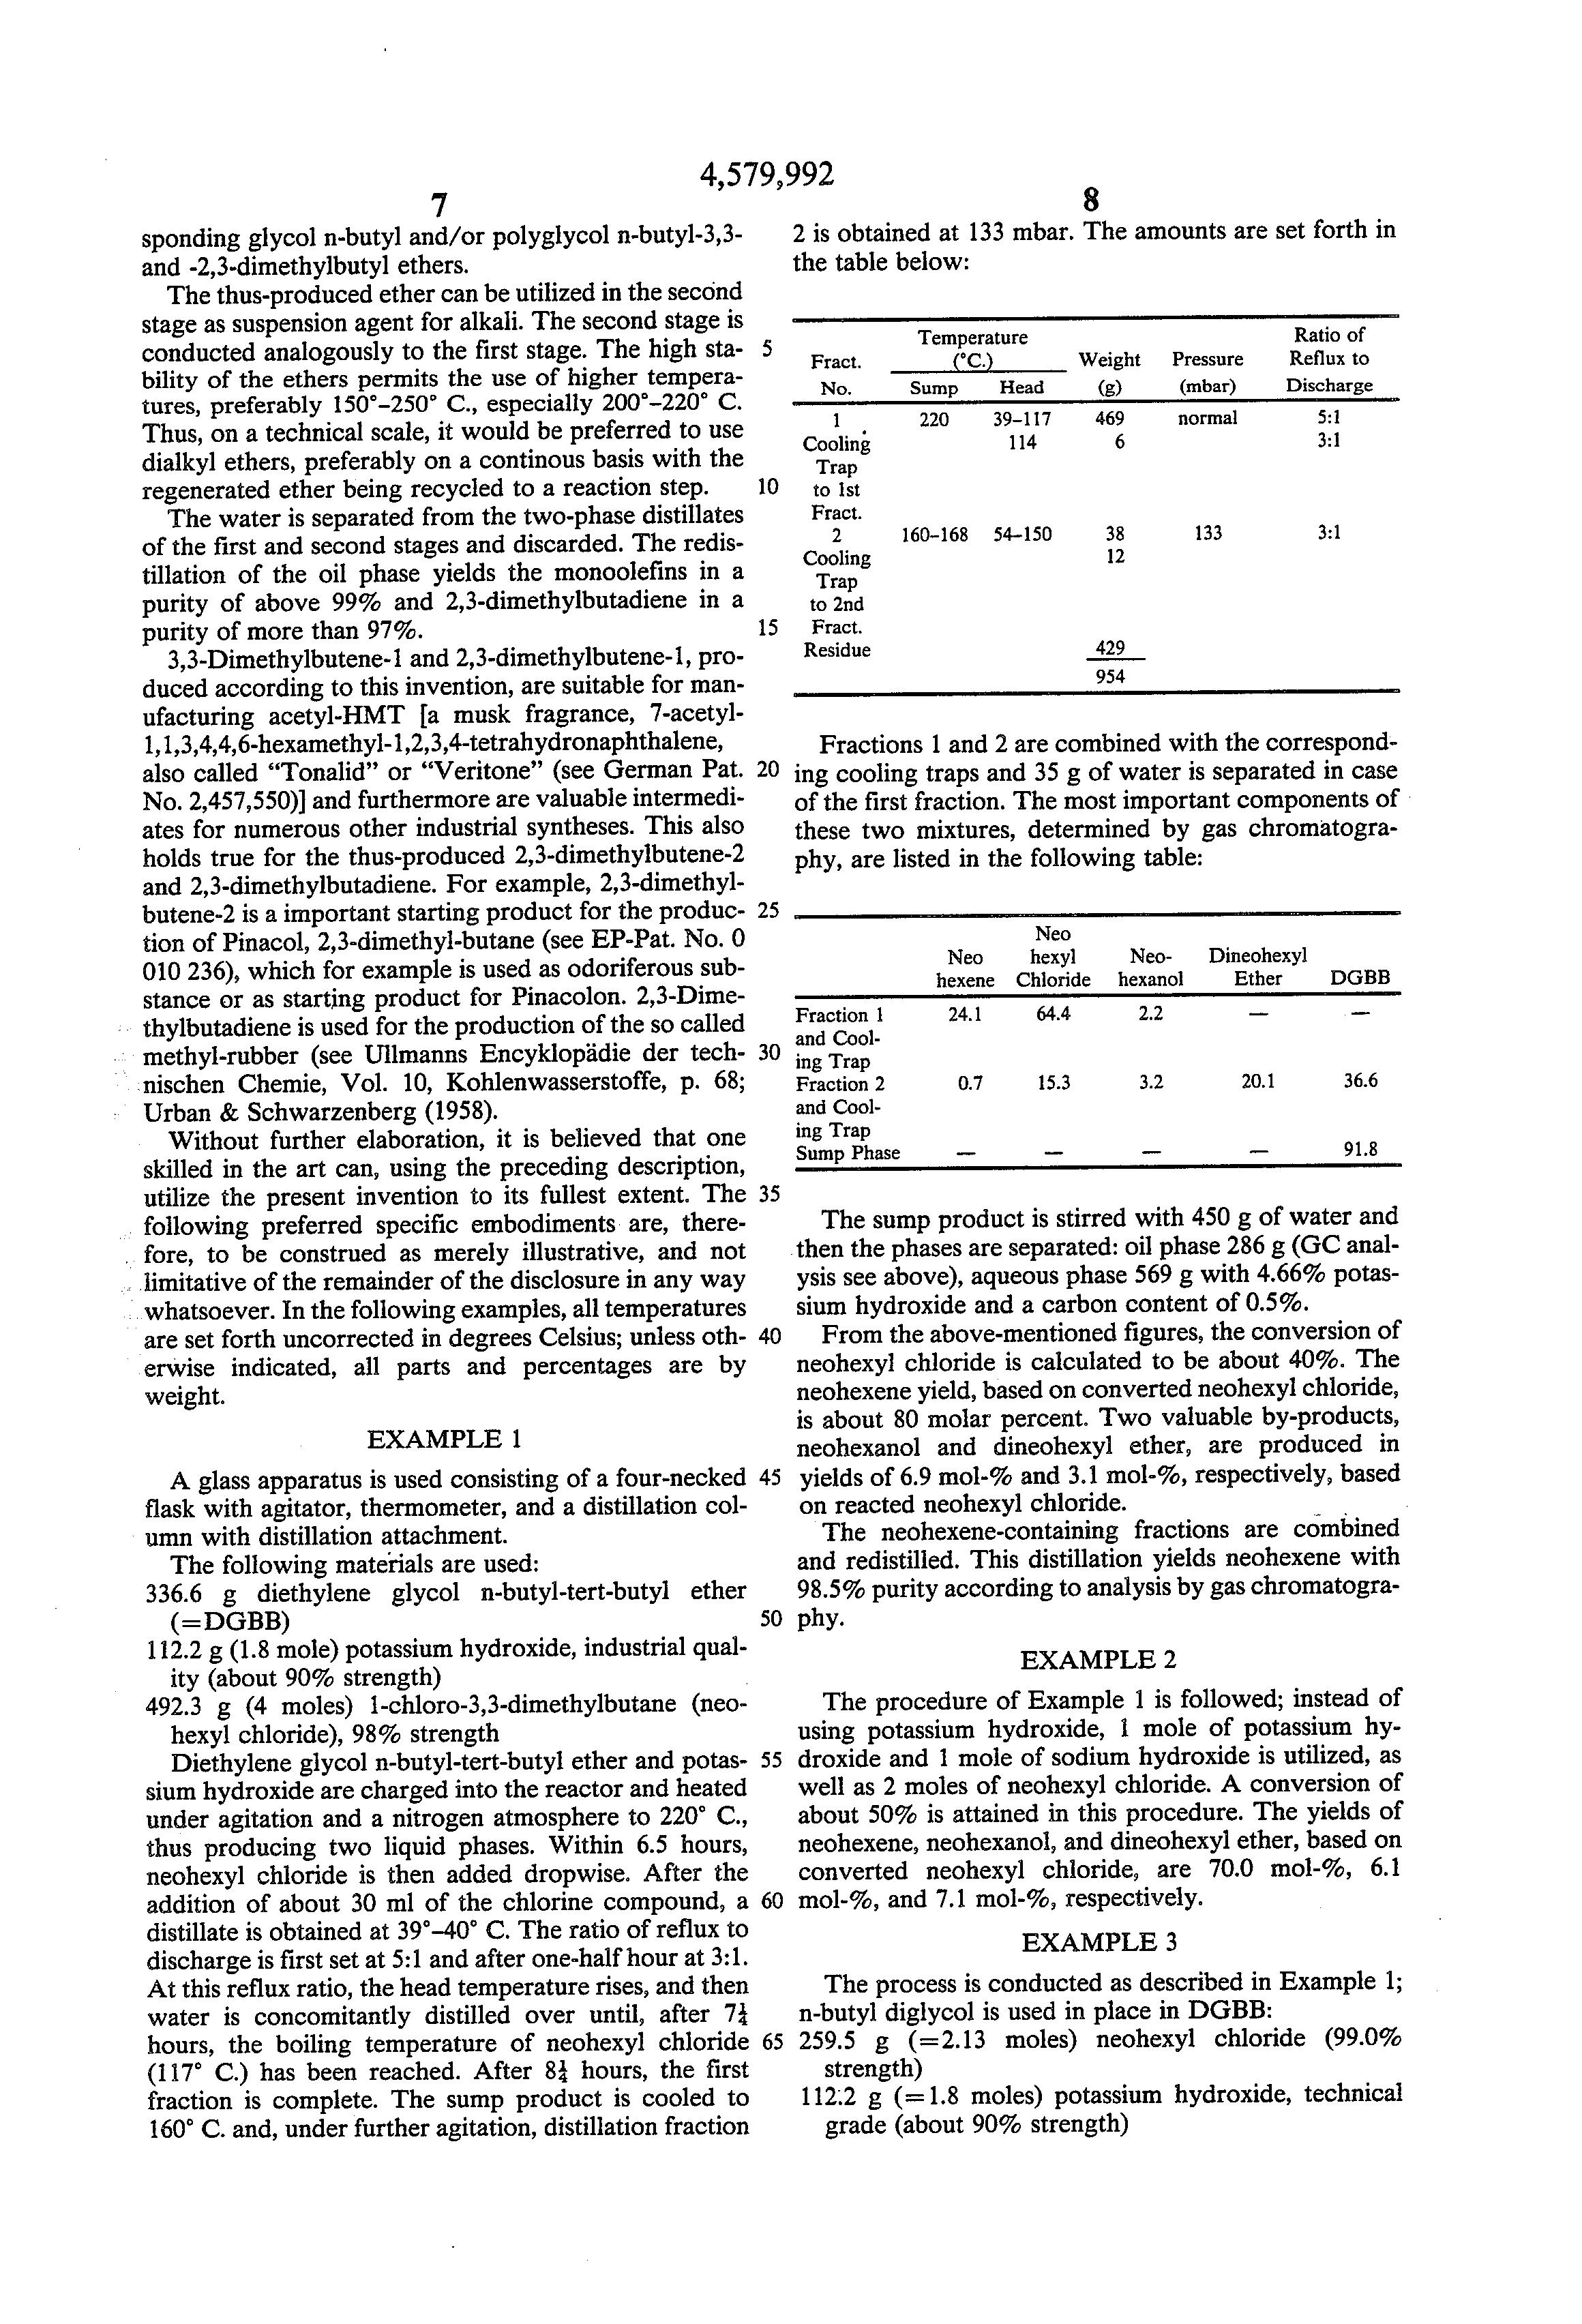 23dimethylbutene  C6H12  ChemSpider